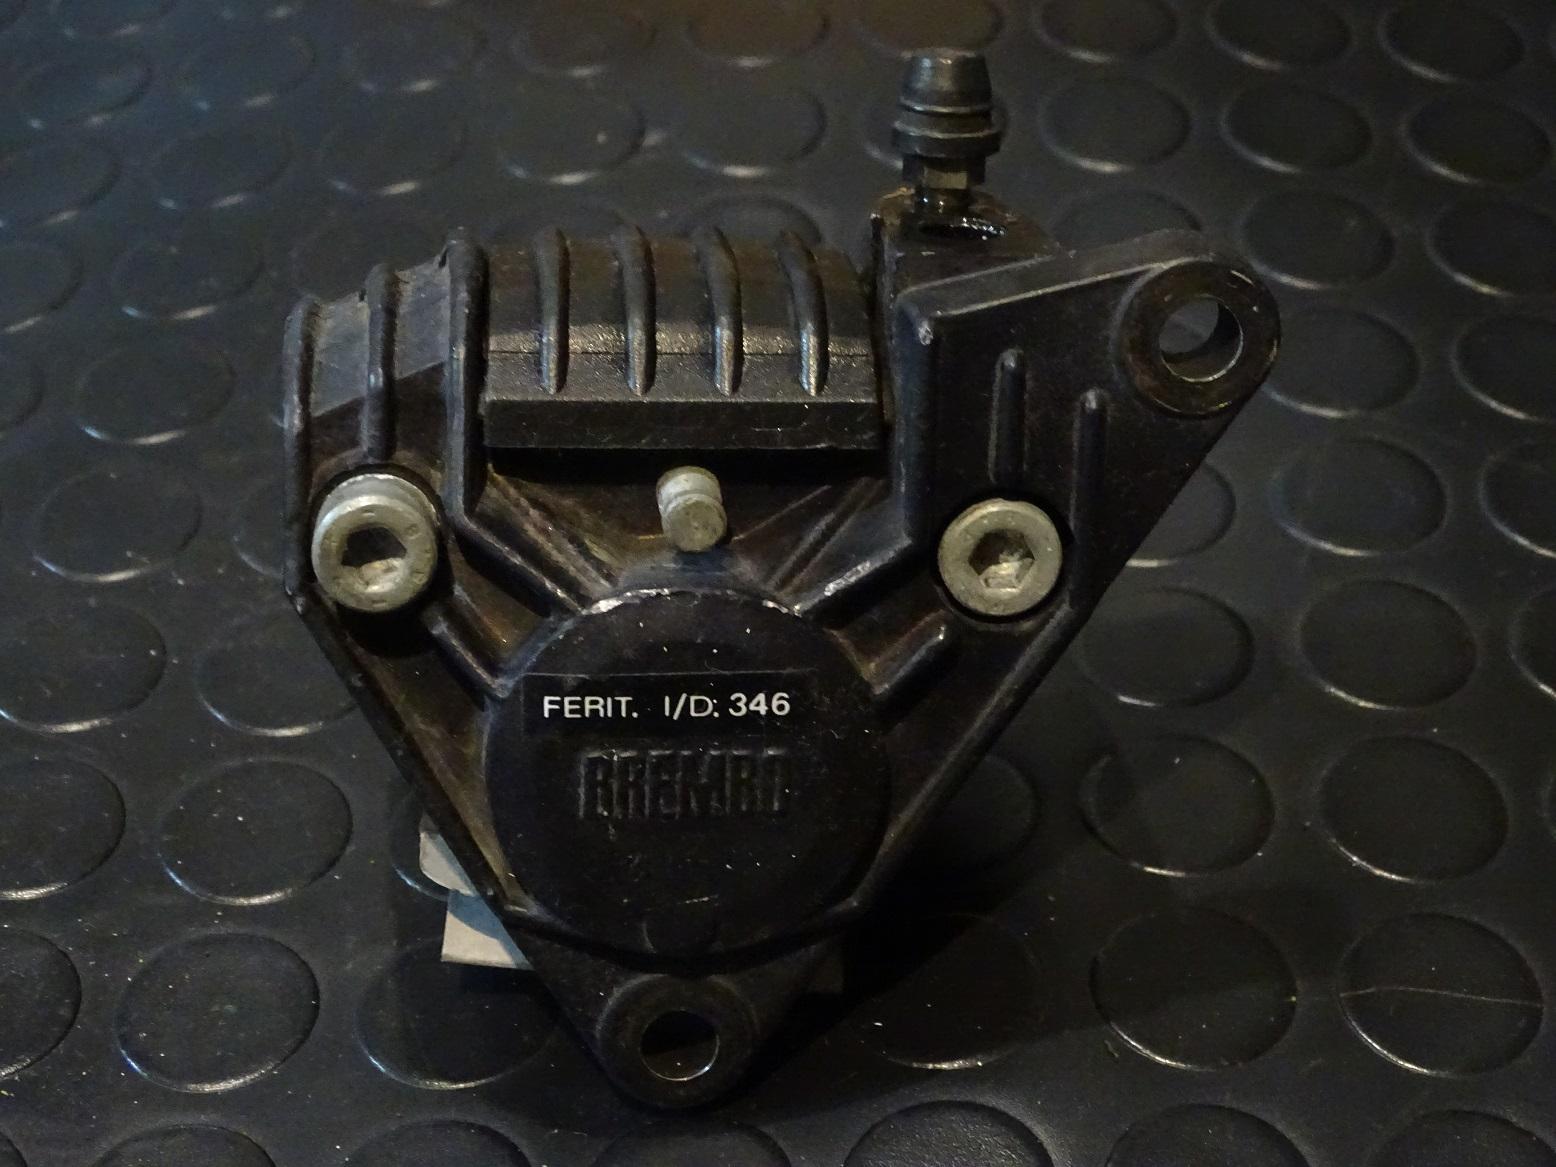 PINZA FRENO ANTERIORE DESTRA USATA MOTO GUZZI V35 350 ANNO 1985